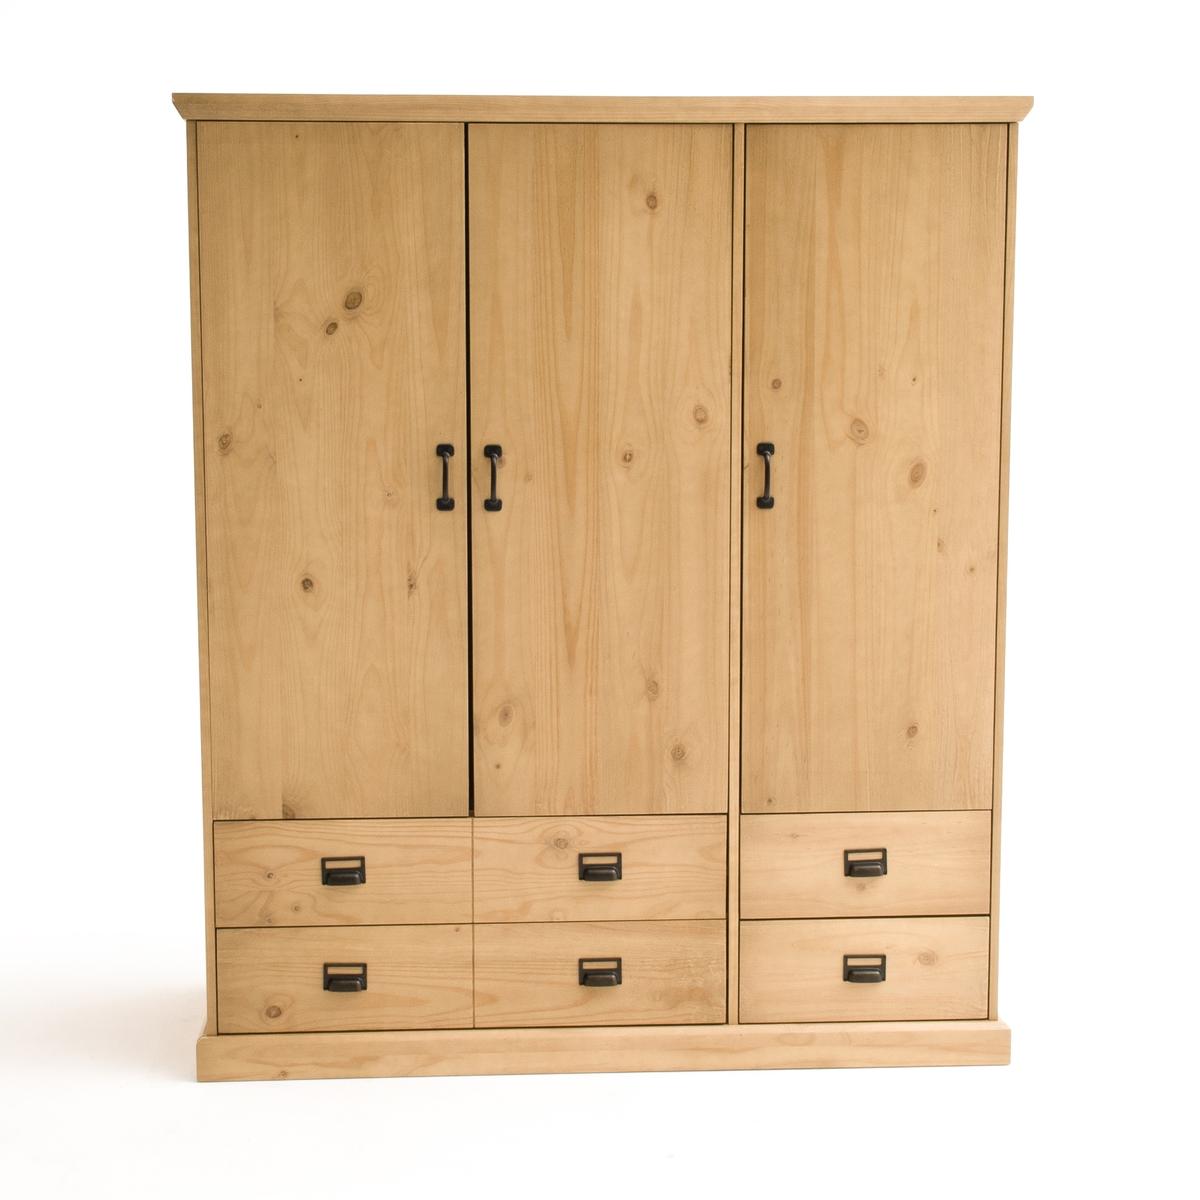 Шкаф Lindley, 3 дверки, 4 ящика, 2/3 вешалки, 1/3 белье 3m 05744 hookit 2 3 4 x 16 1 2 hand file board